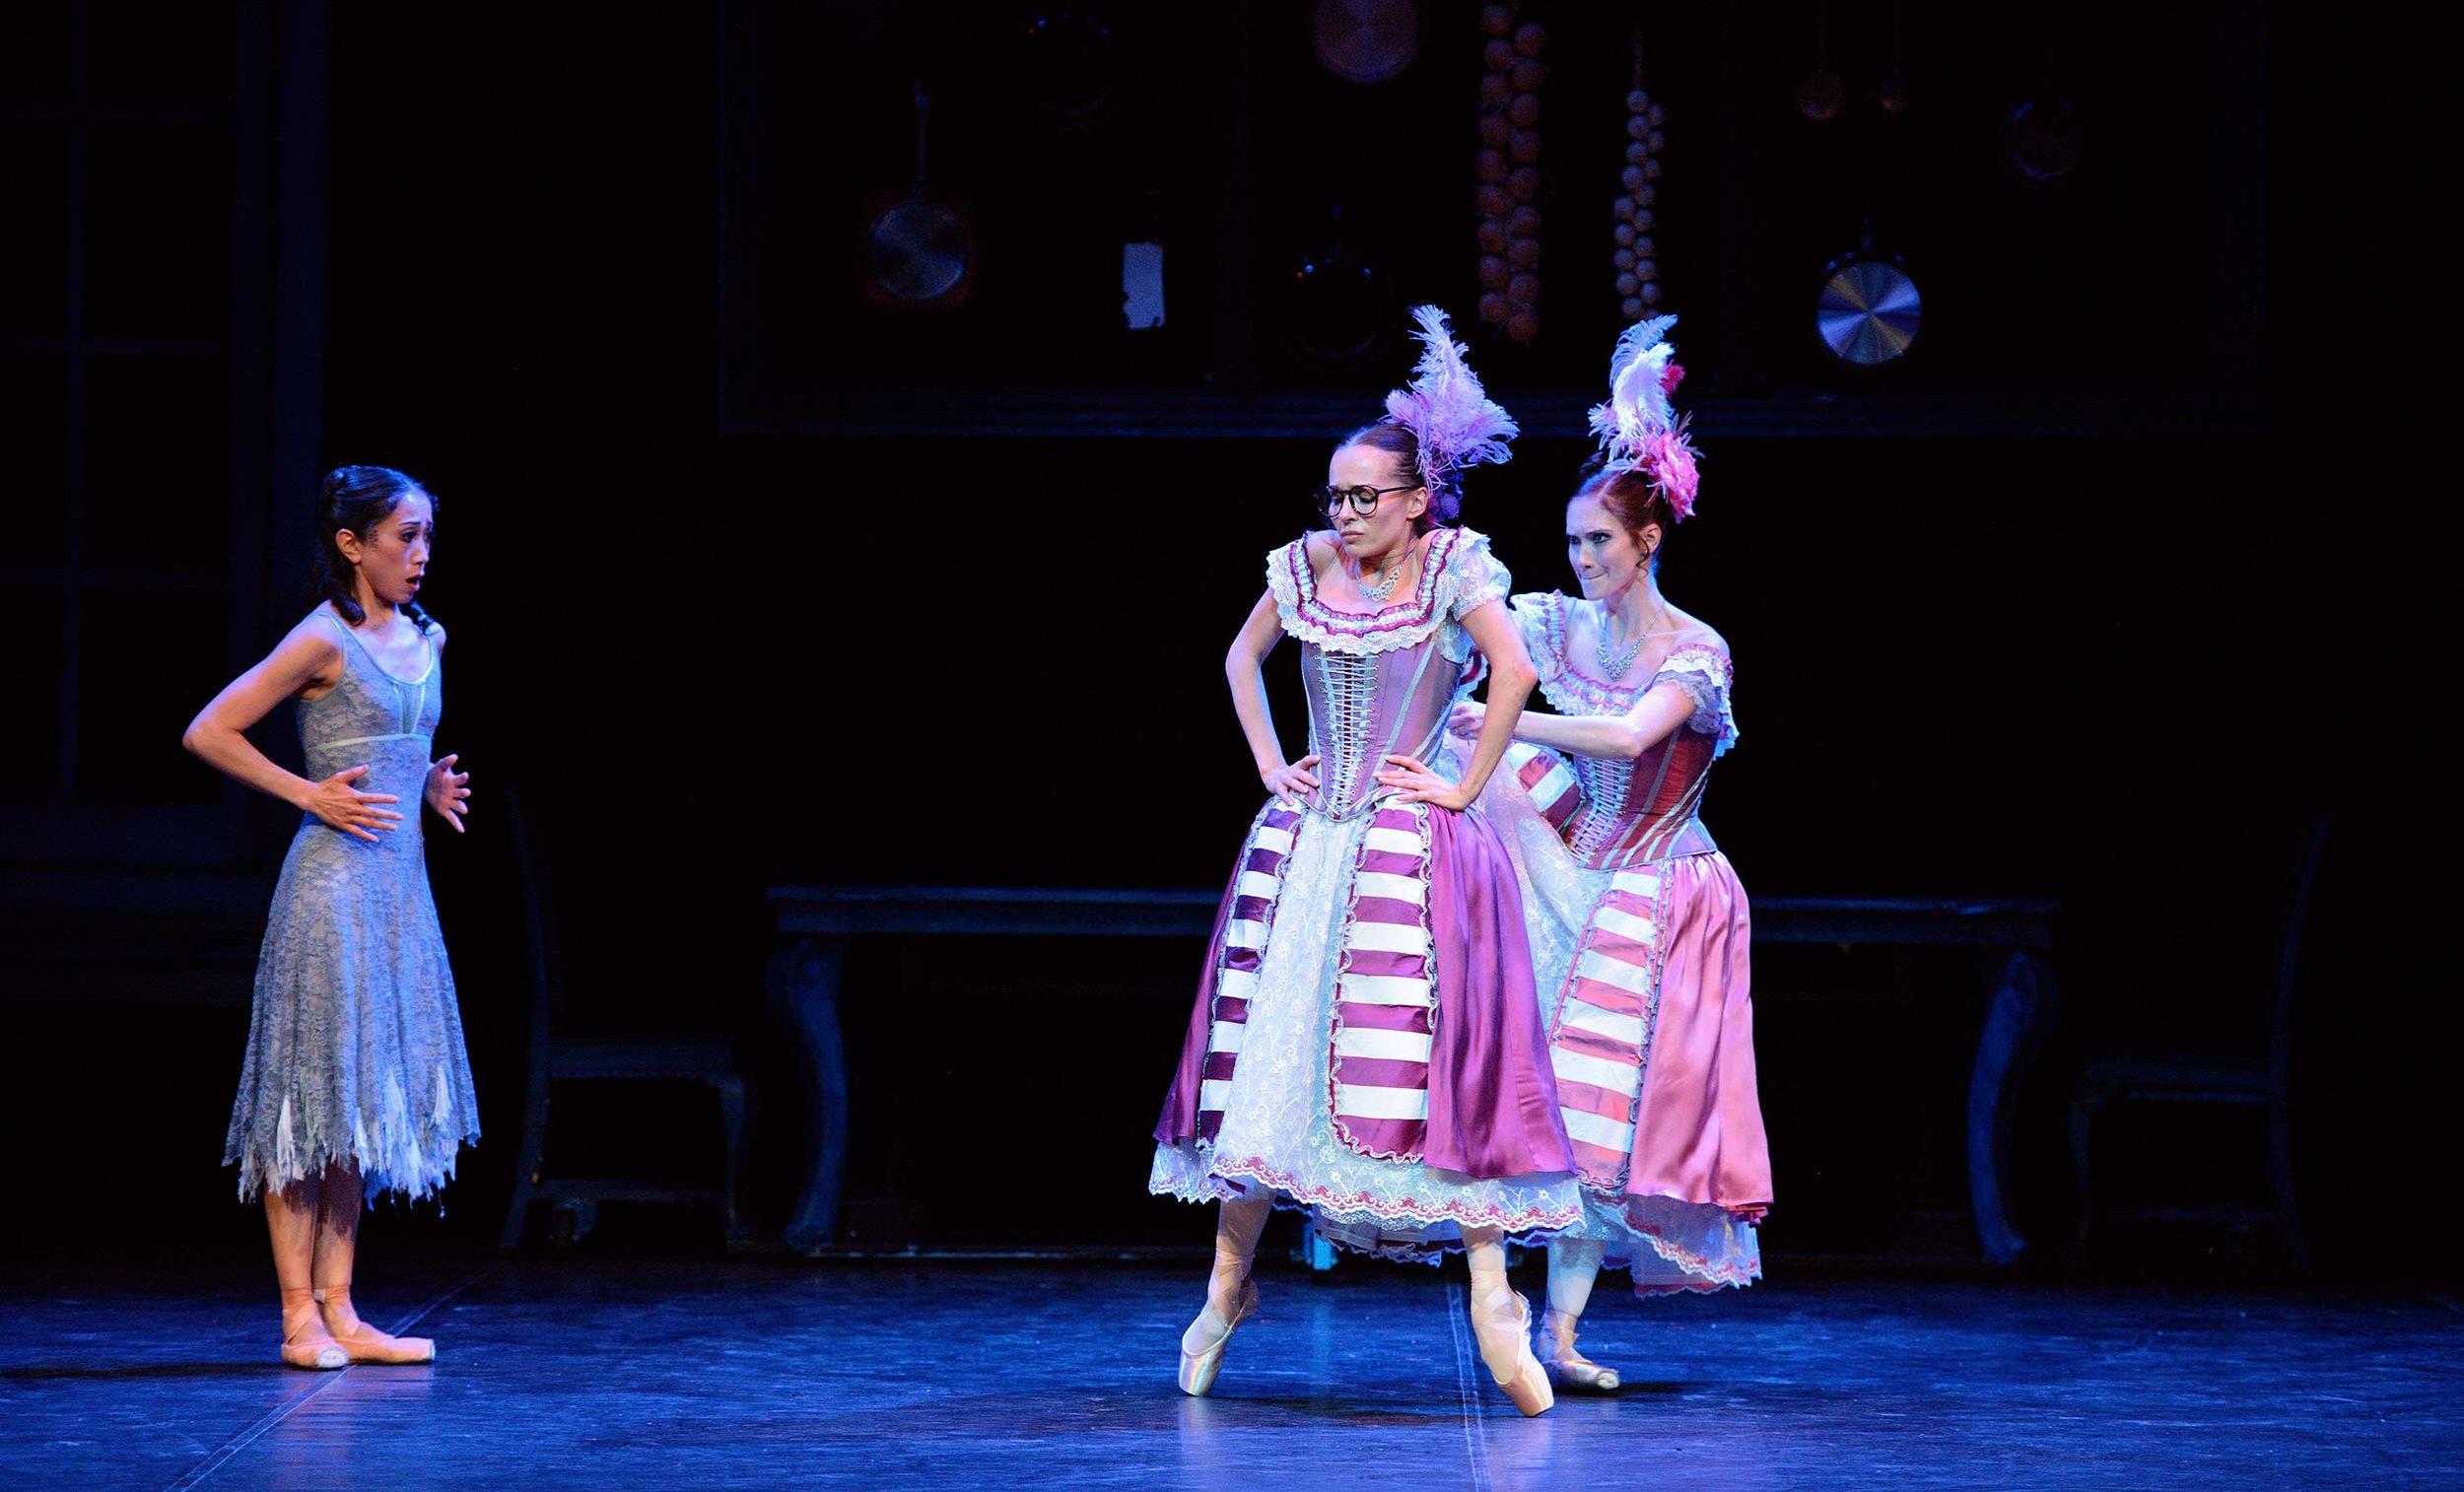 WEB-Erina-Takahashi-with-Katja-Khaiukova-and-Alison-McWhinney-in-English-National-Ballet's-Cinderella-(C)-Laurent-Liotardo